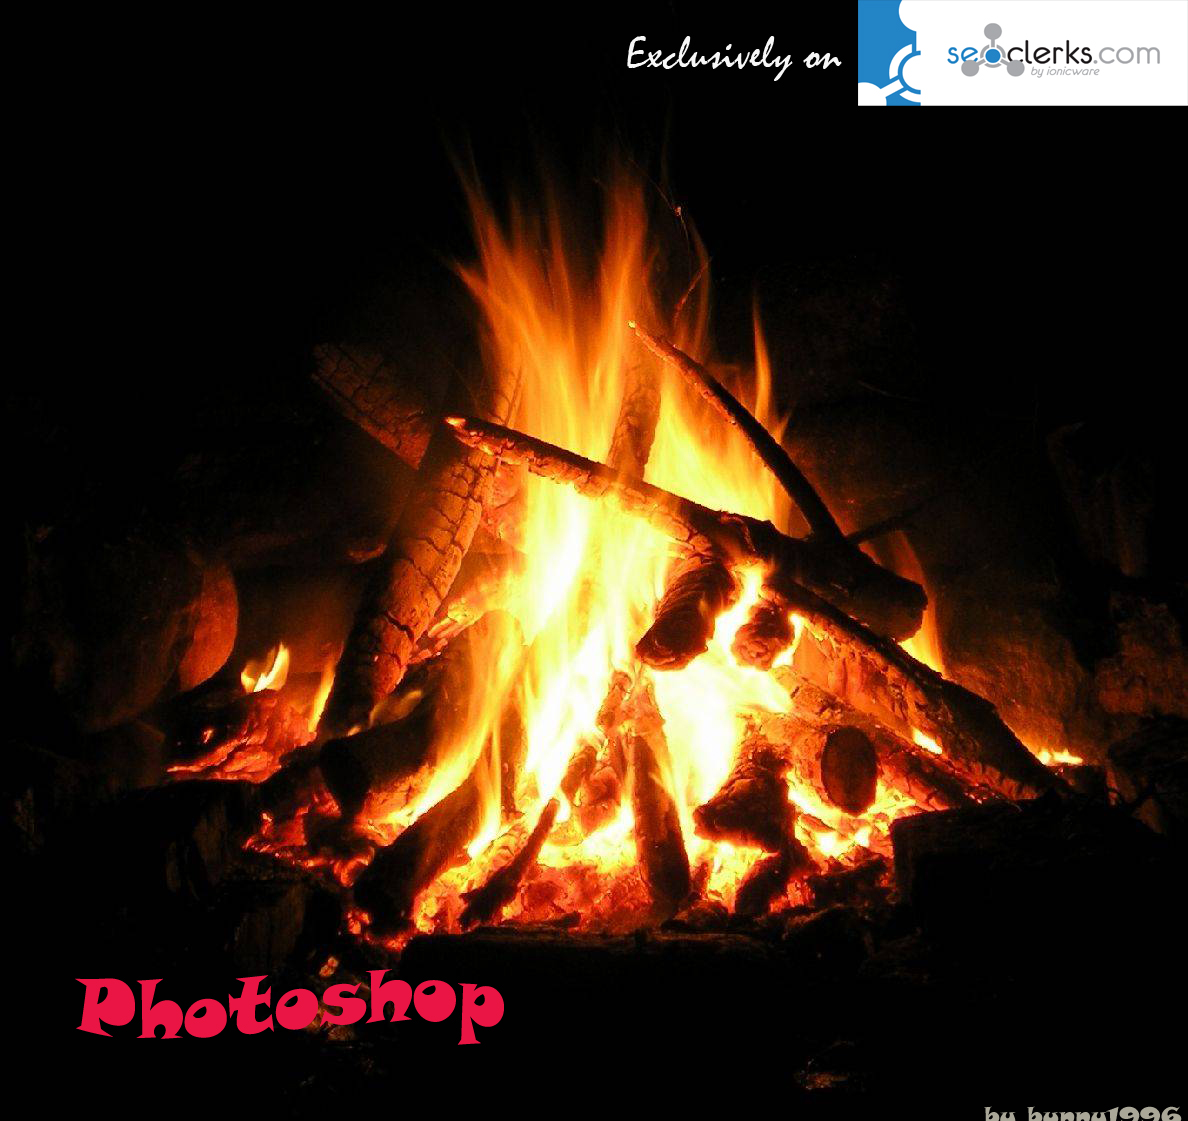 resize or edit photo with photoshop